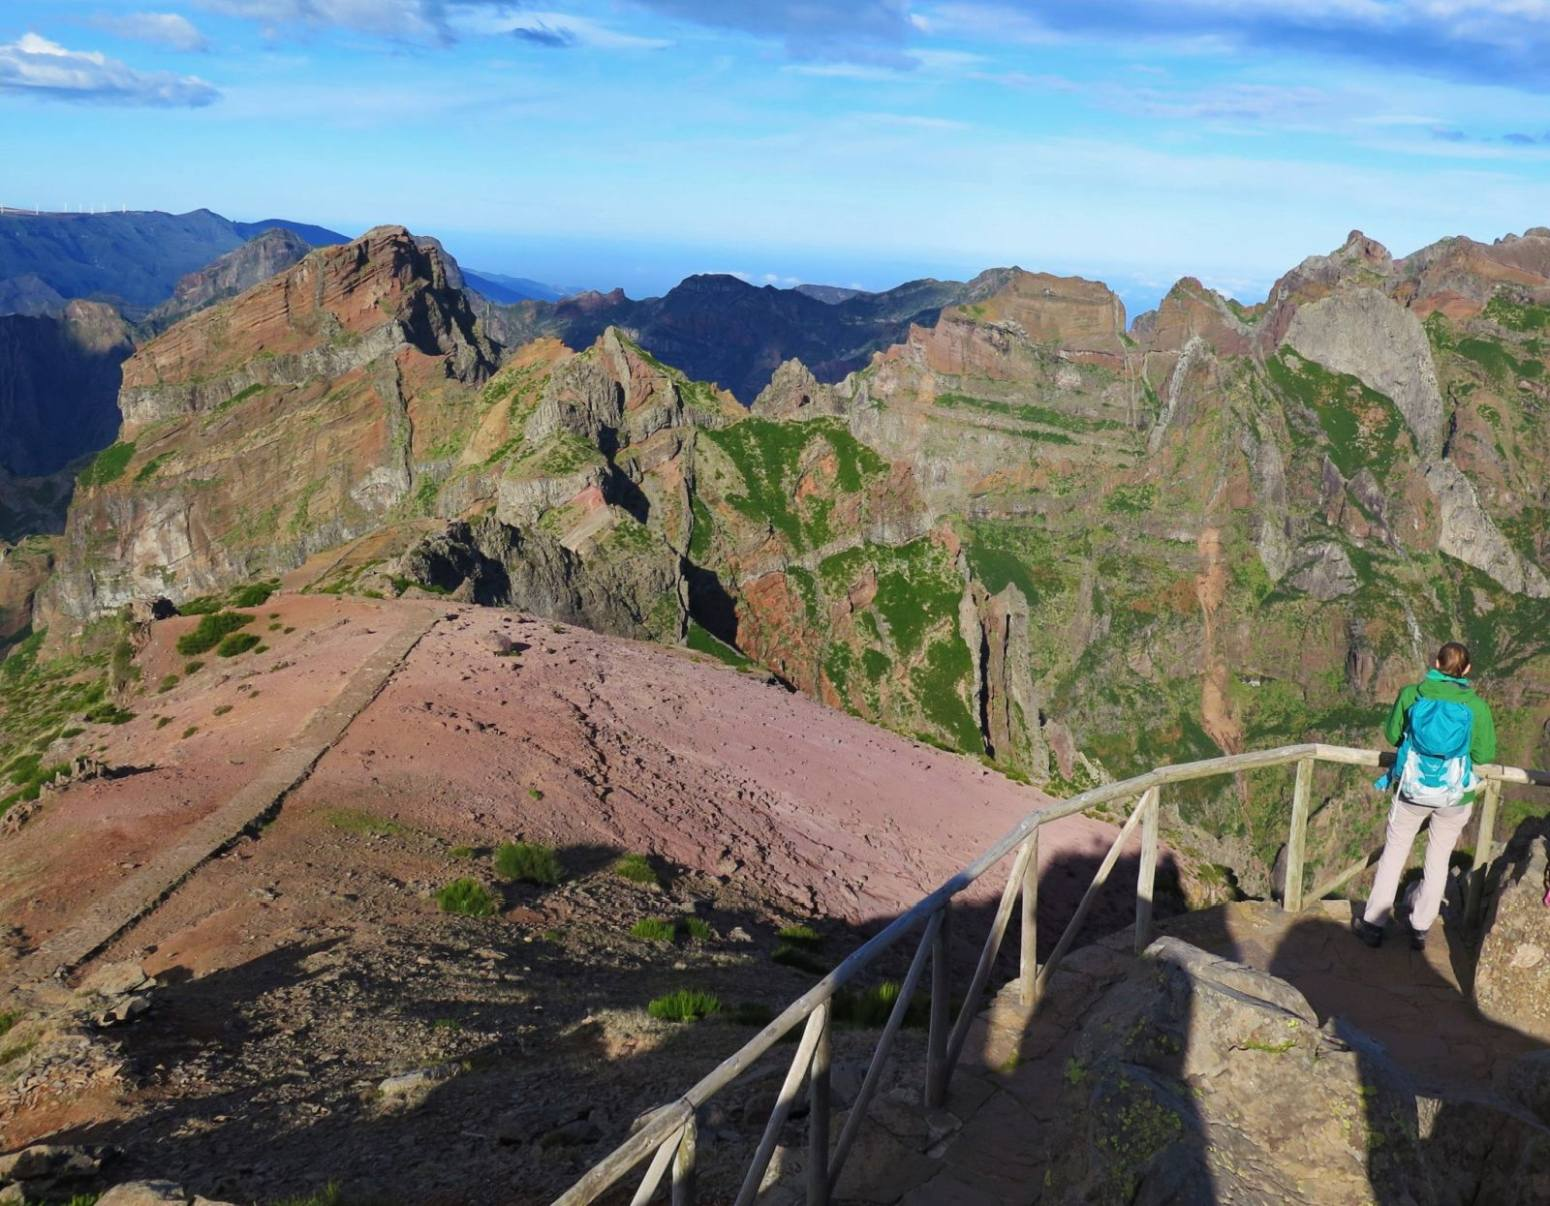 Turisti na Pico do Arieiro, Madeira, Jana Kristekova